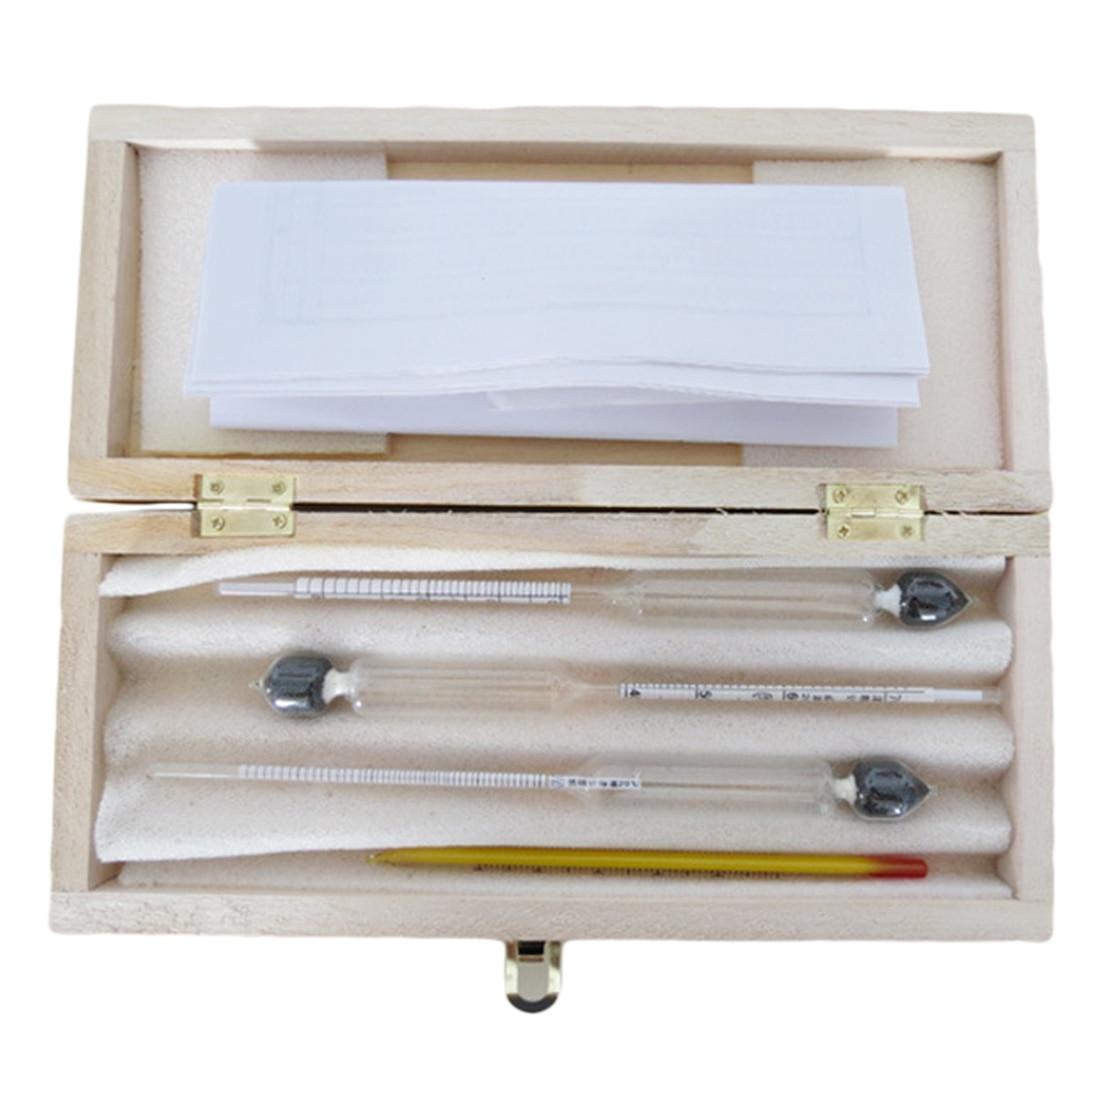 Caliente 3 unids/set alcoholímetro vino metros alcohol concentración alcohol instrumento hidrómetro probador